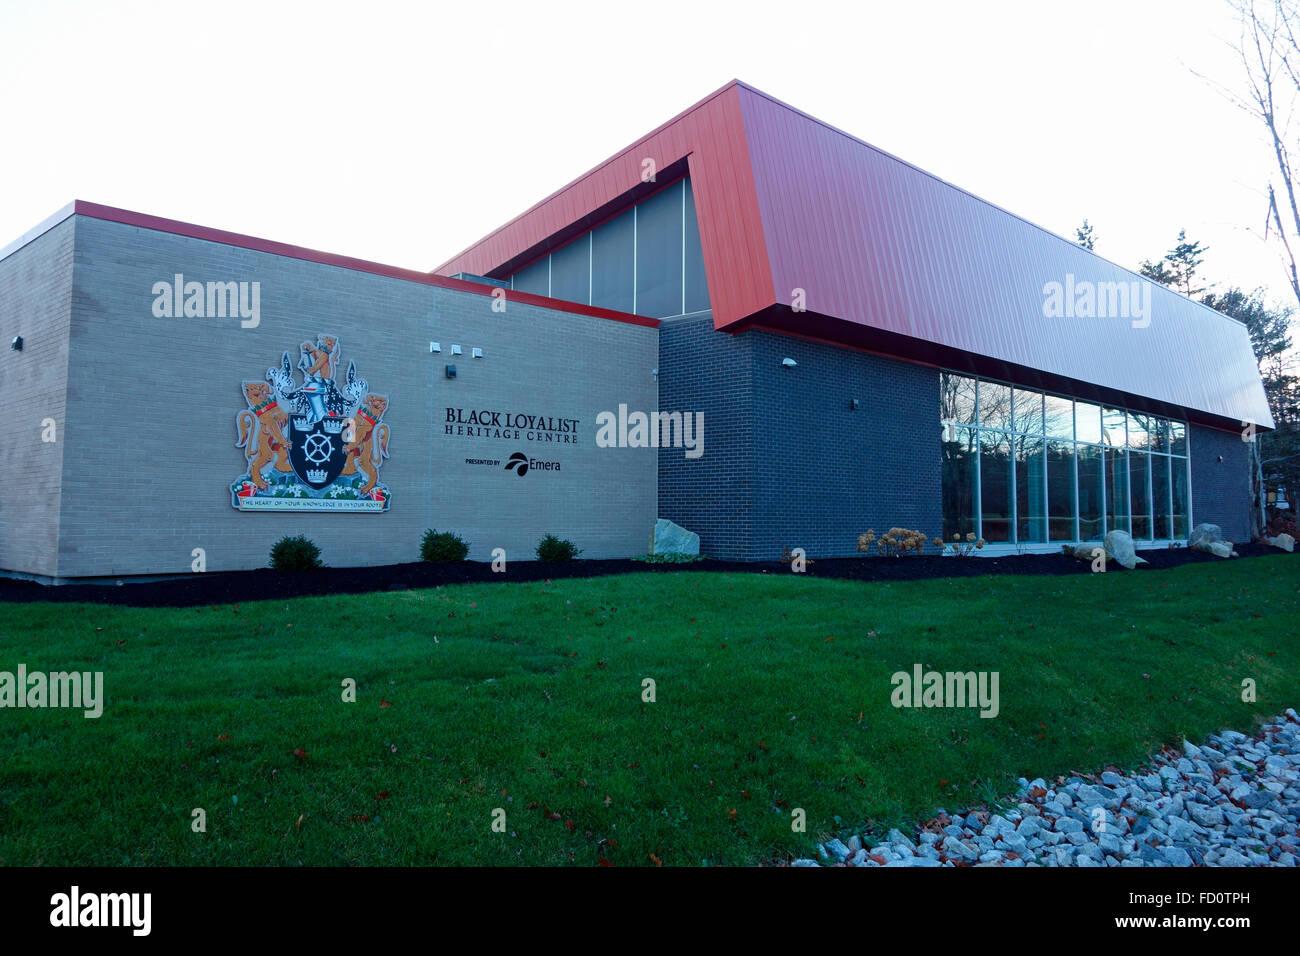 The Black Loyalist Museum in Shelburne, Nova Scotia - Stock Image